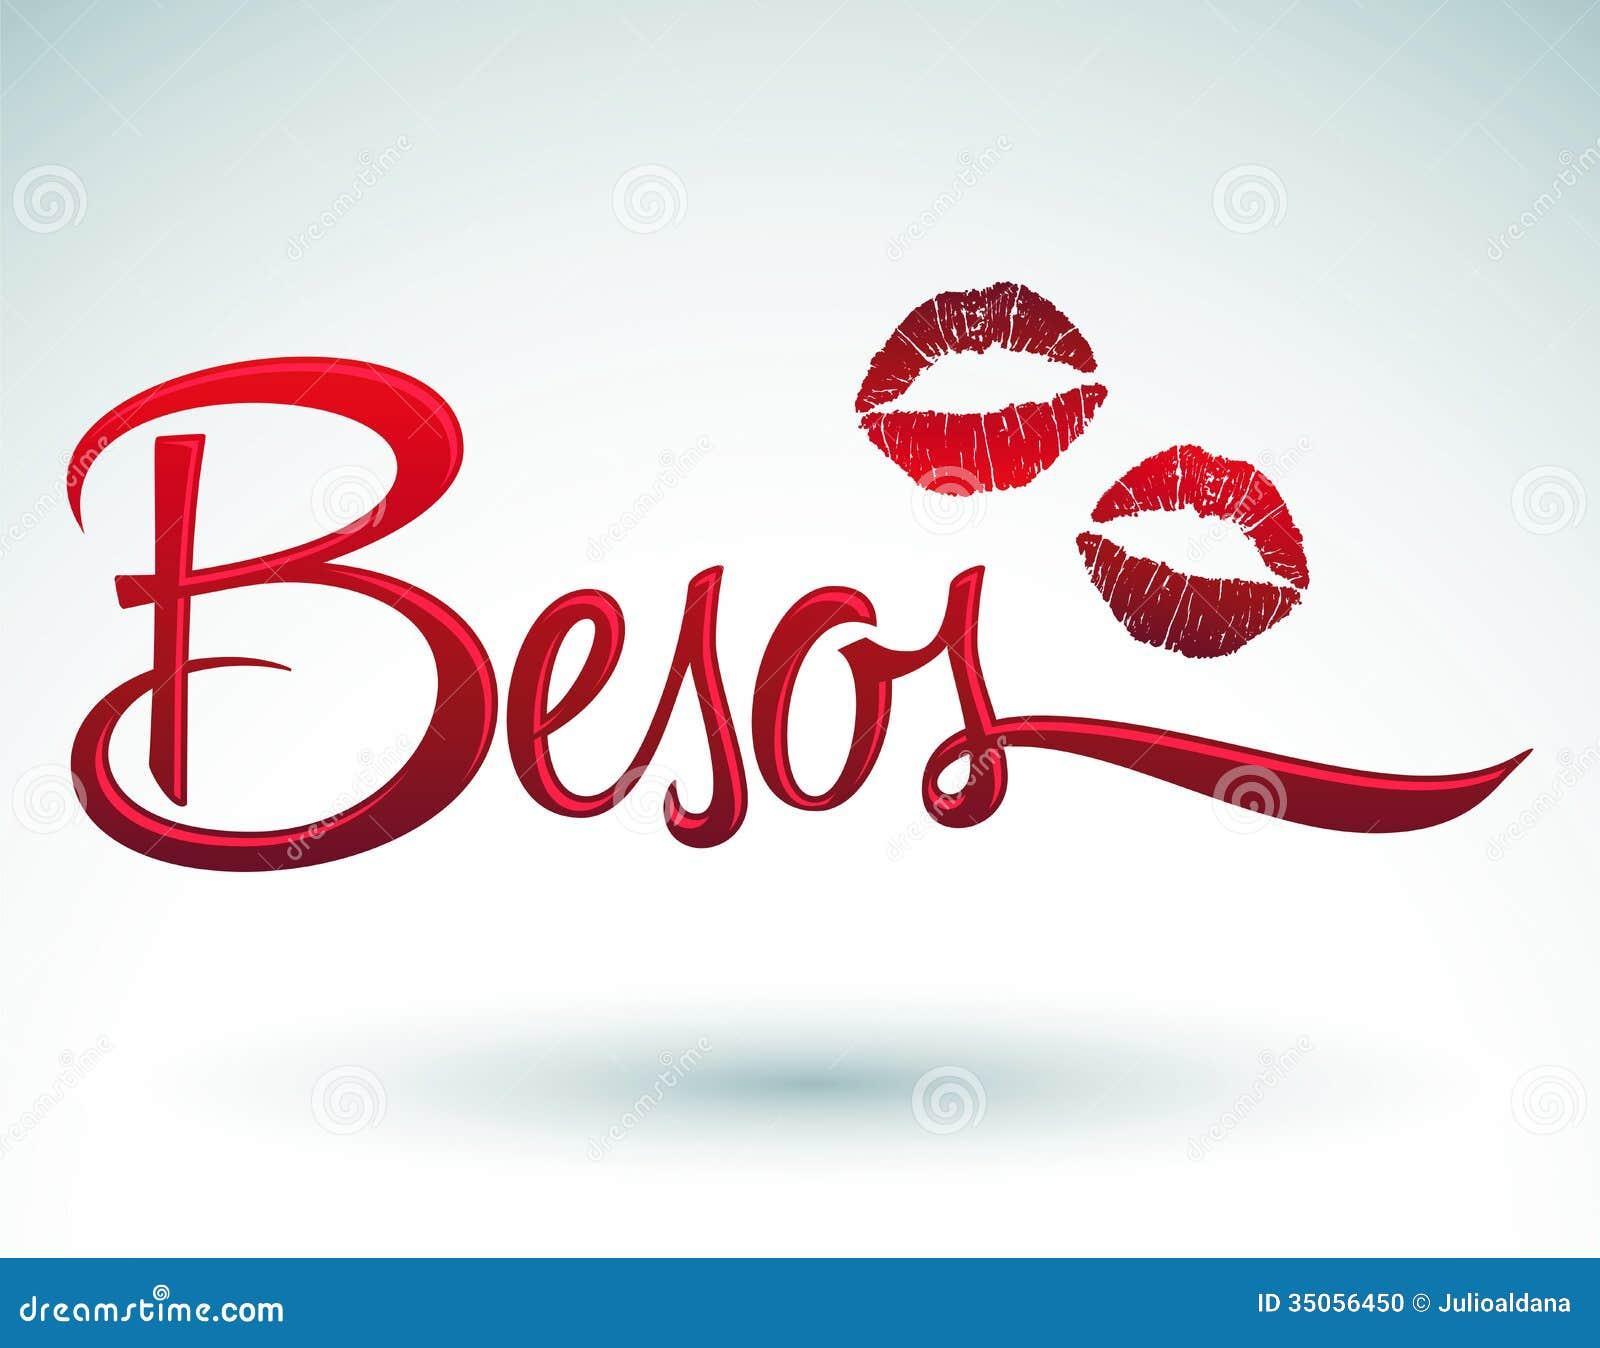 besos -亲吻西班牙人文本